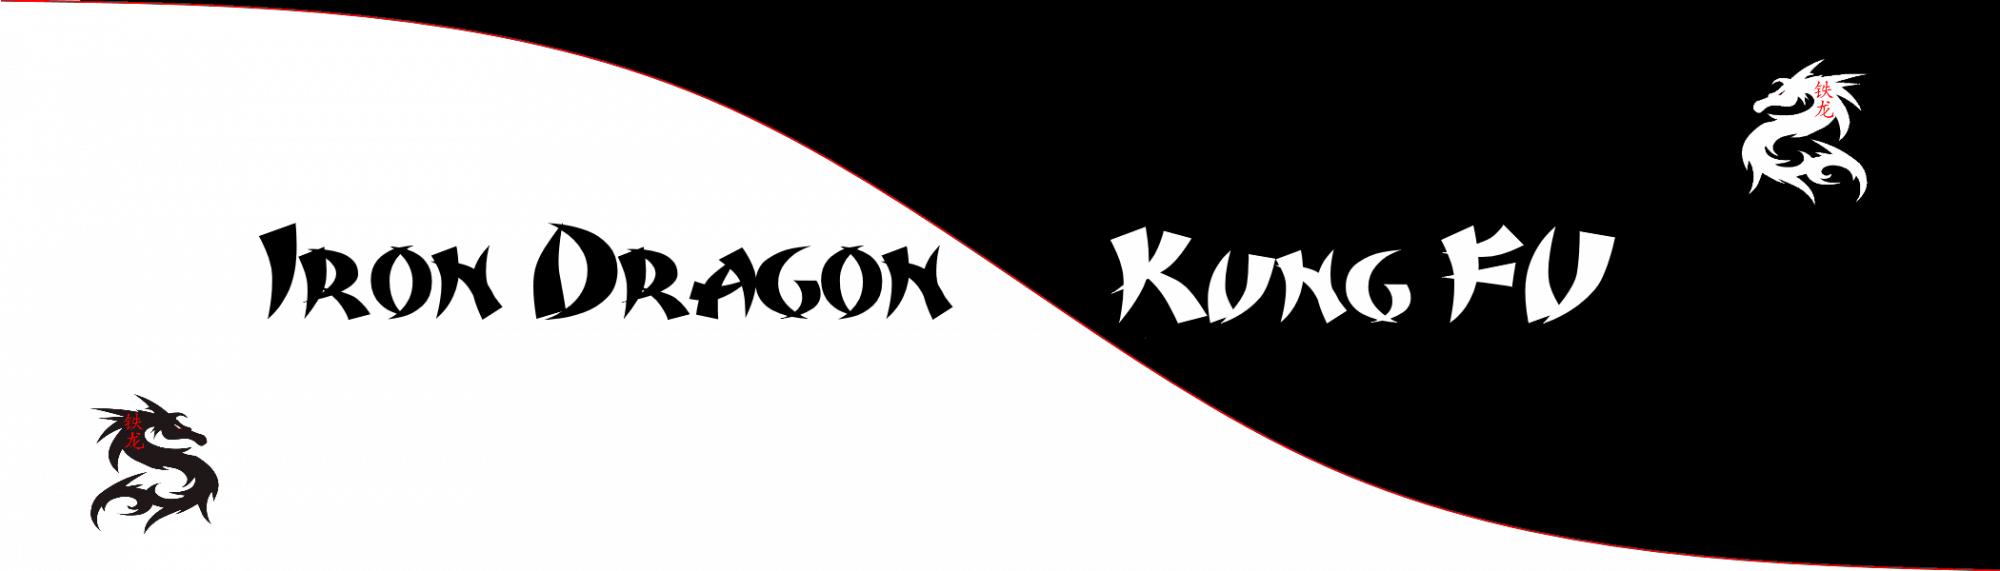 Iron Dragon Kung Fu